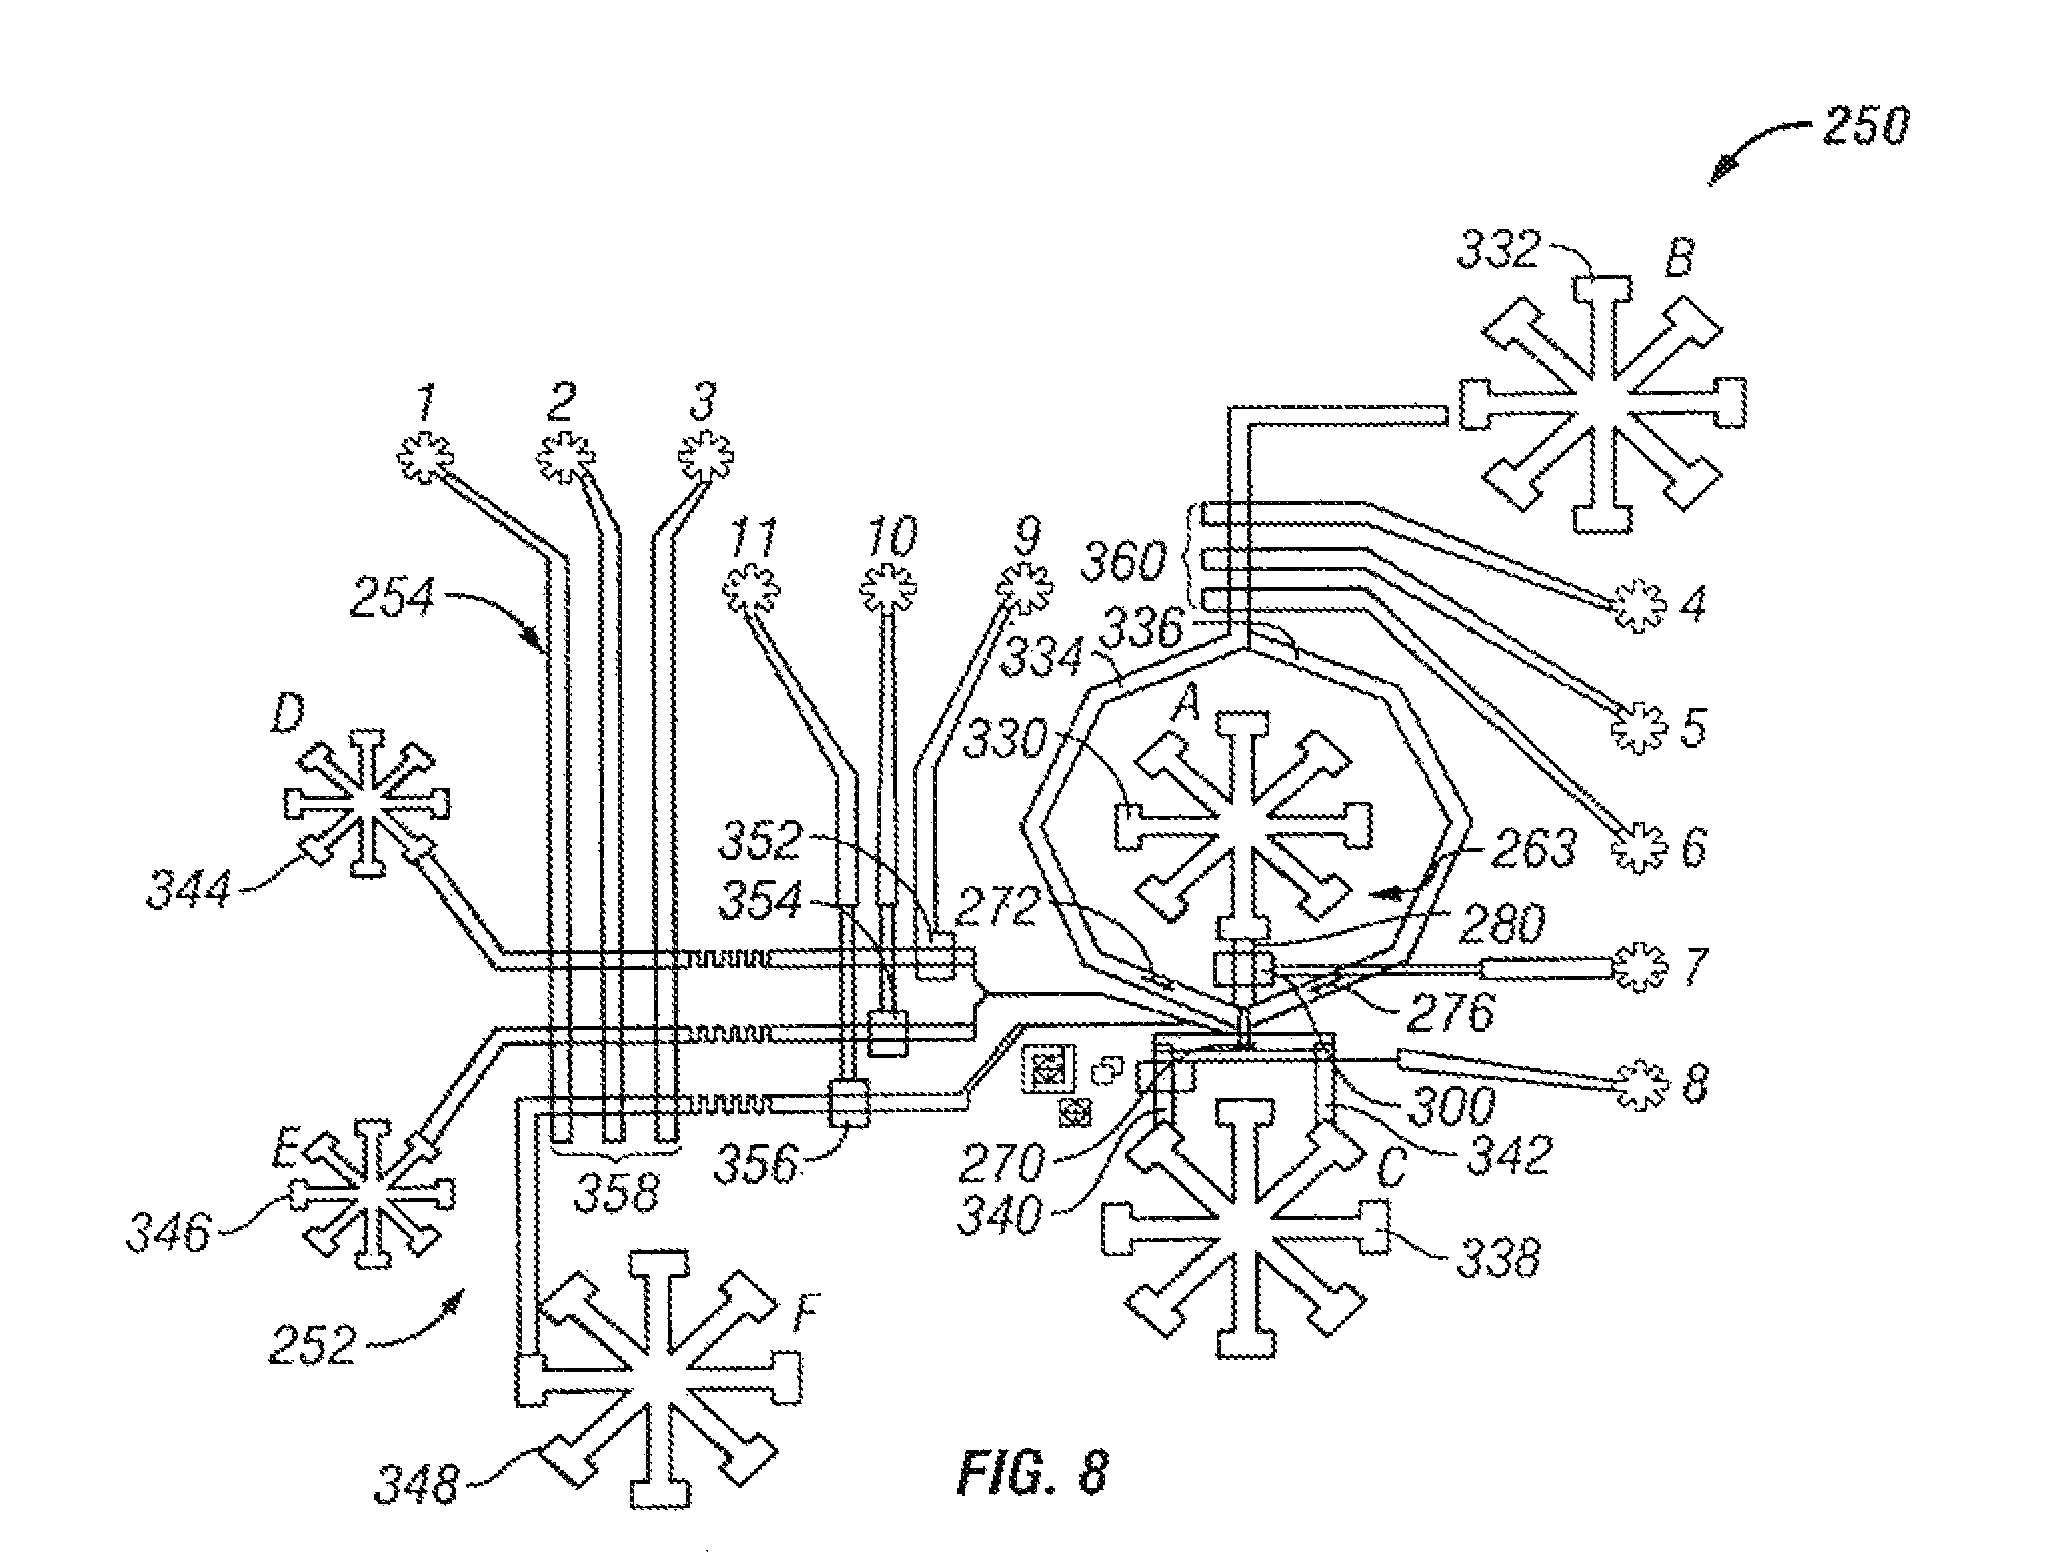 1996 Sea Ray Wiring Diagram | Wiring Diagrams